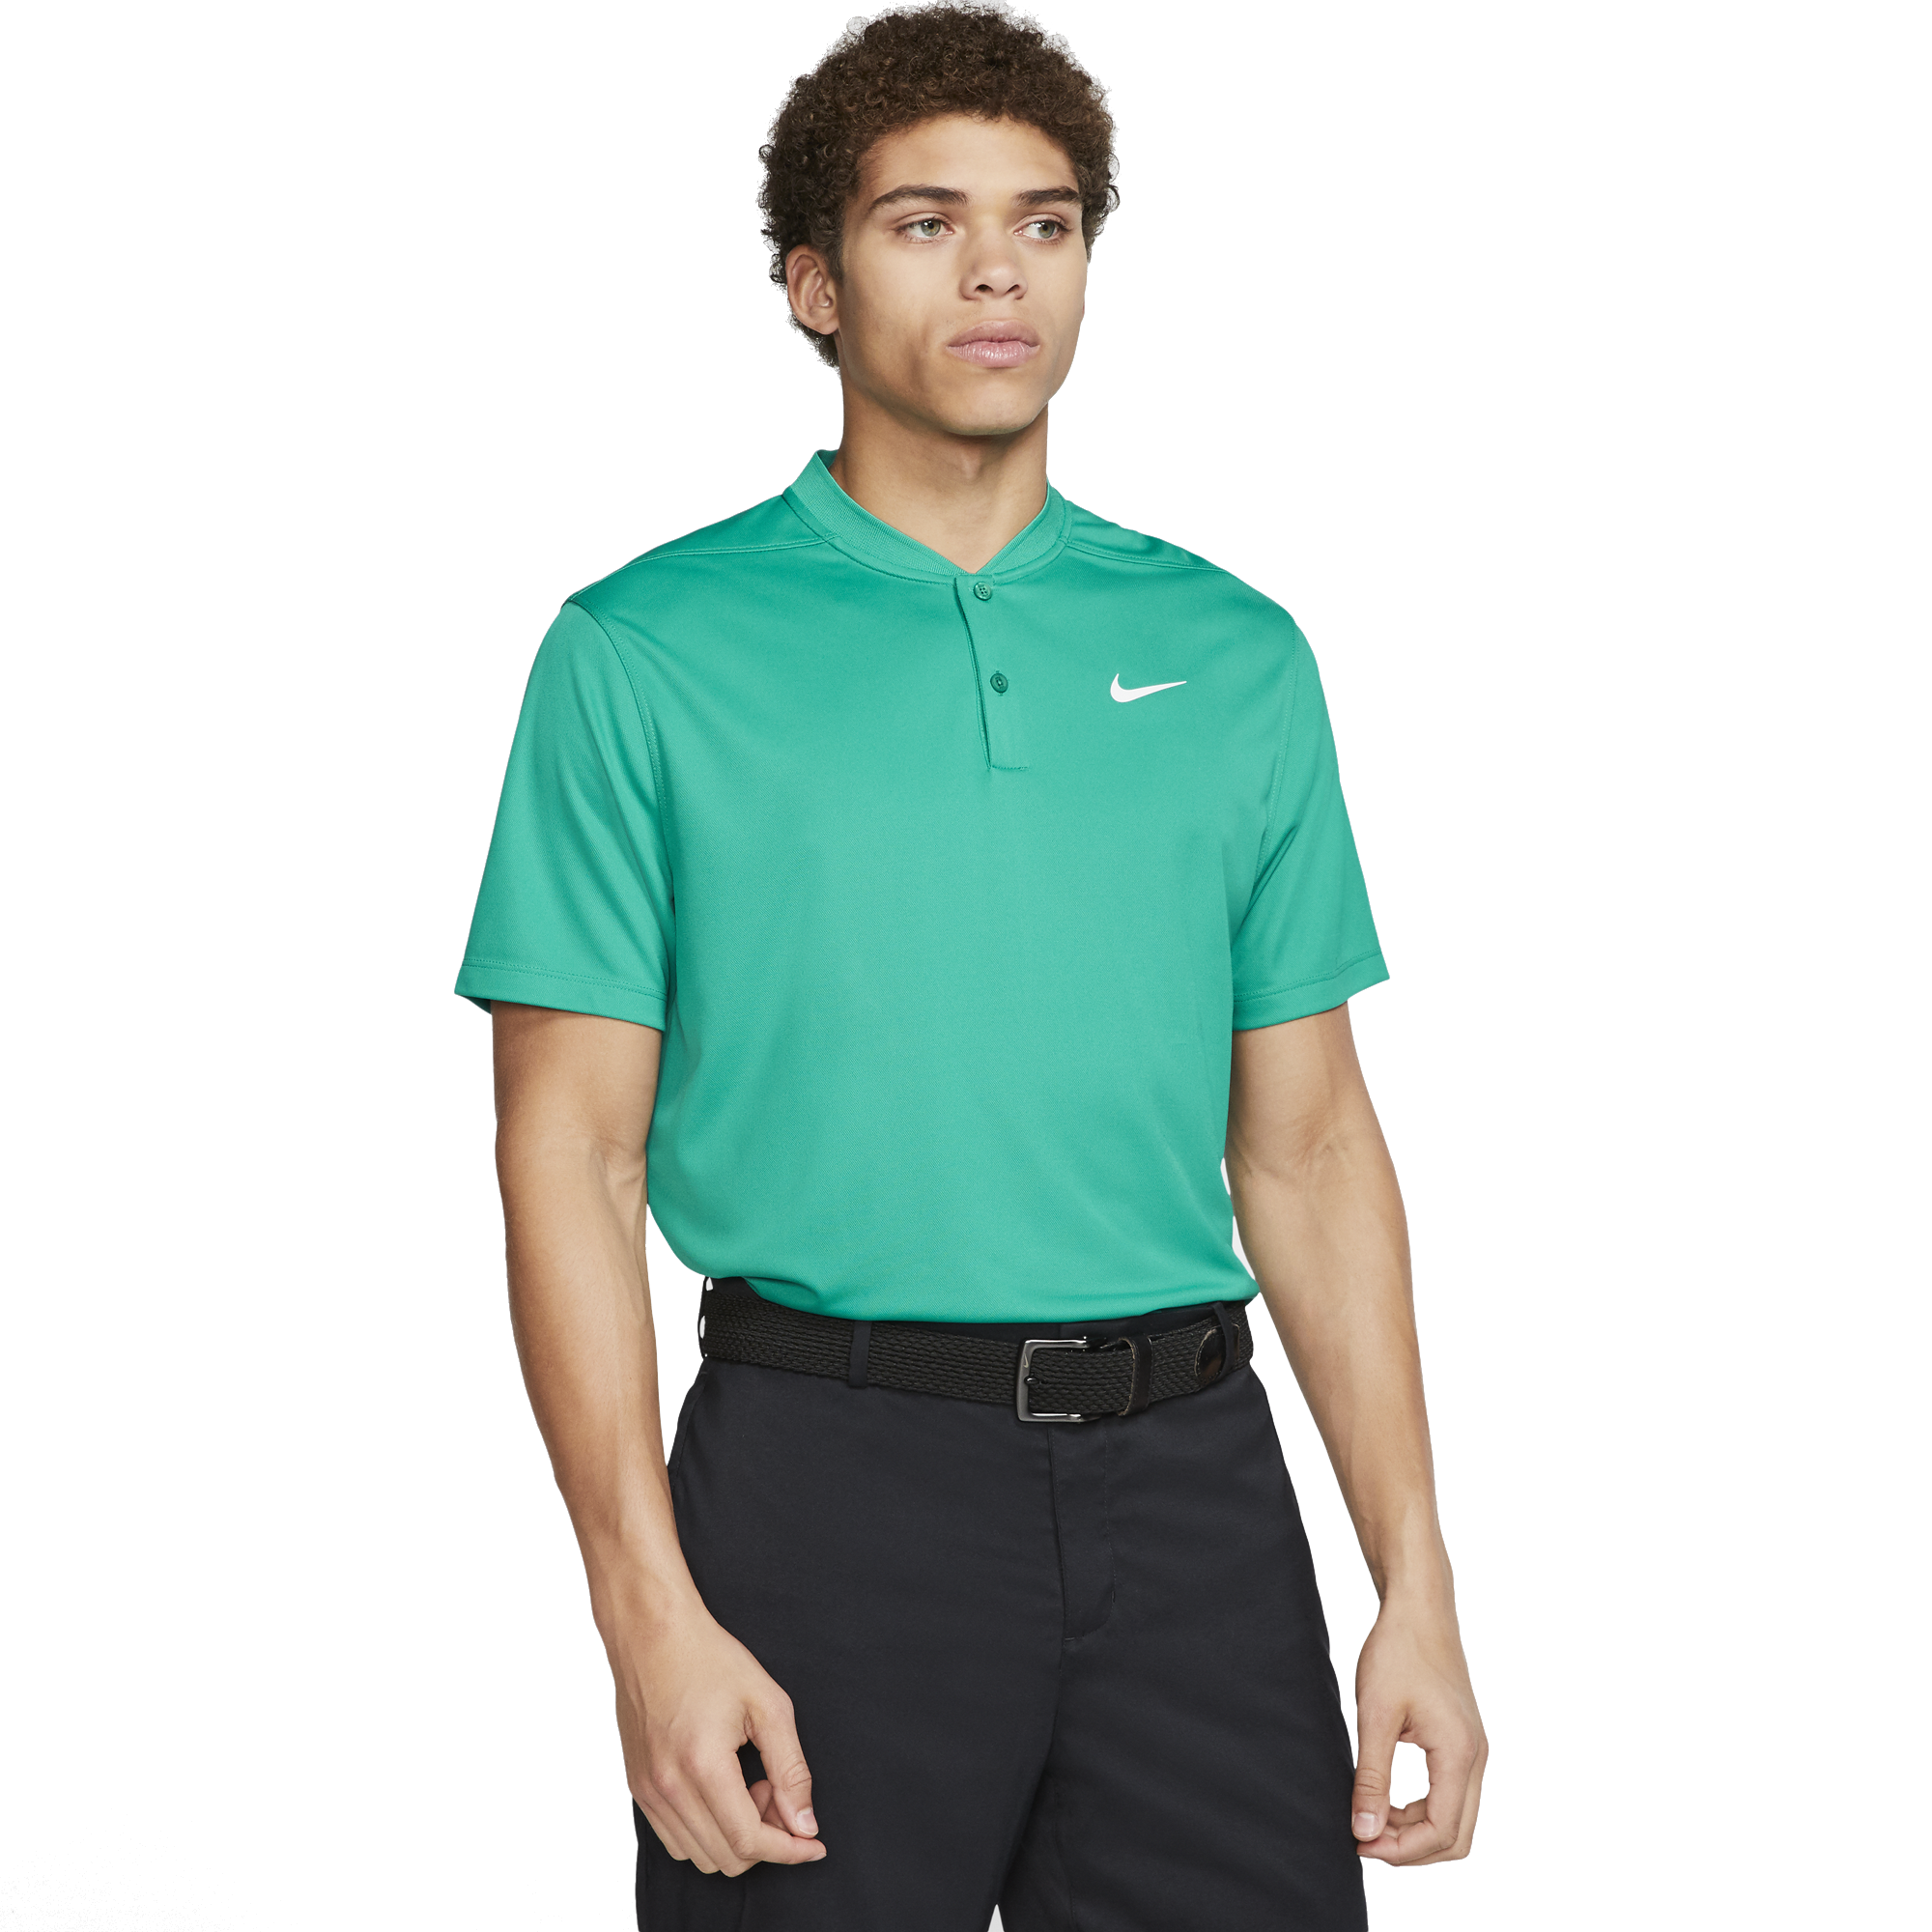 Nike Dri-FIT Victory Blade Collar Men's